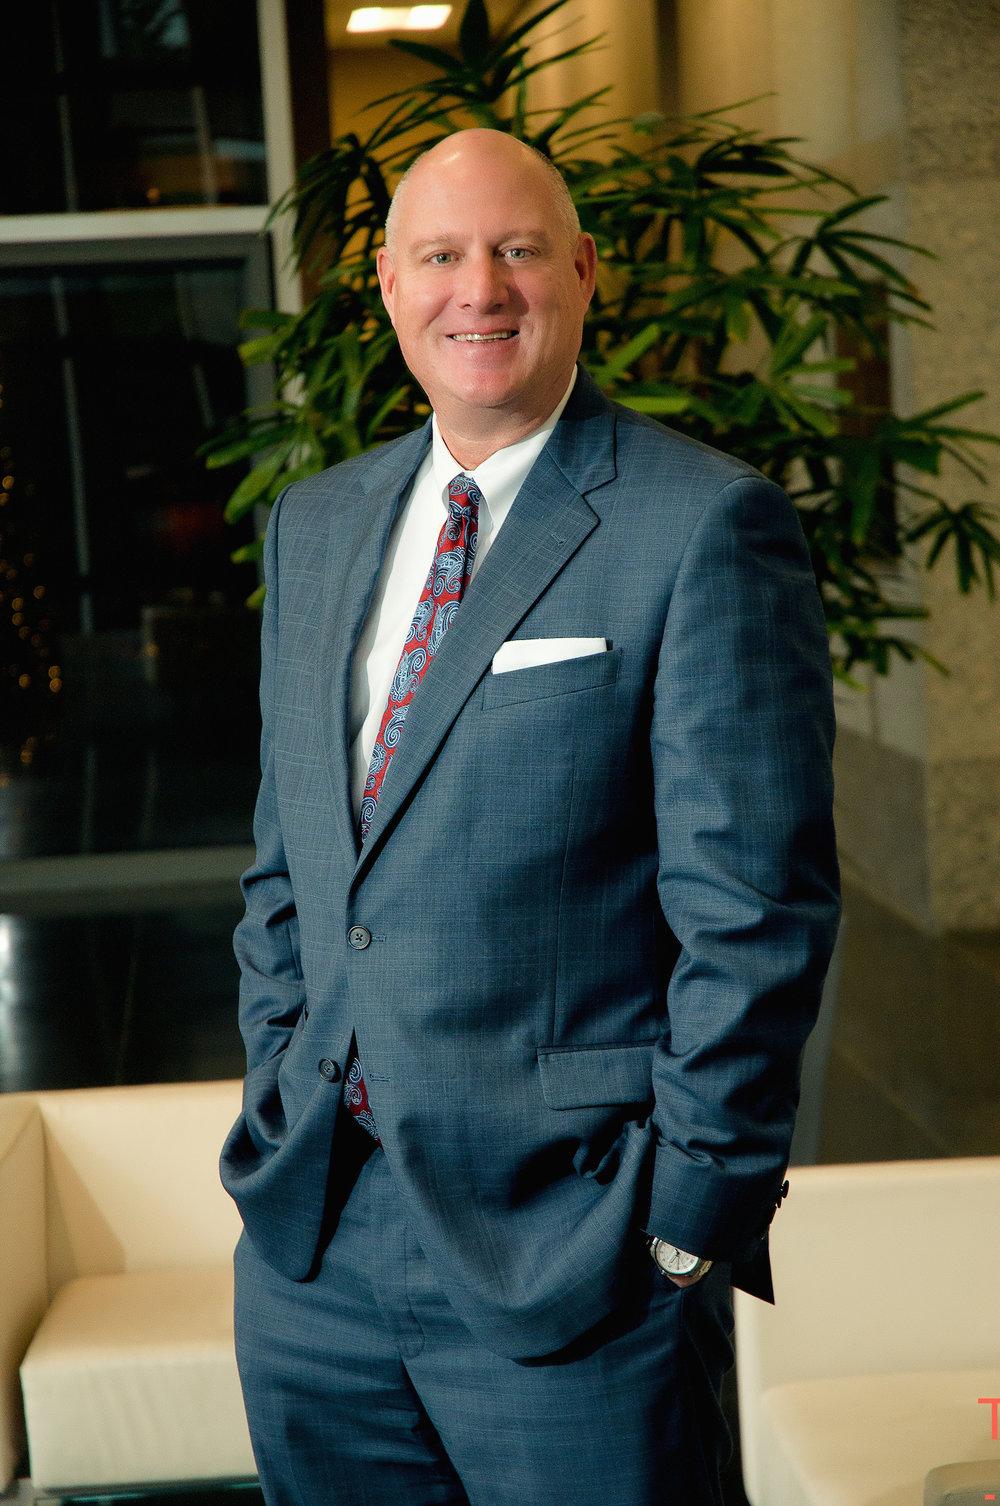 Ebe Cotton Geneva Financial Branch Manager Indianapolis.jpg